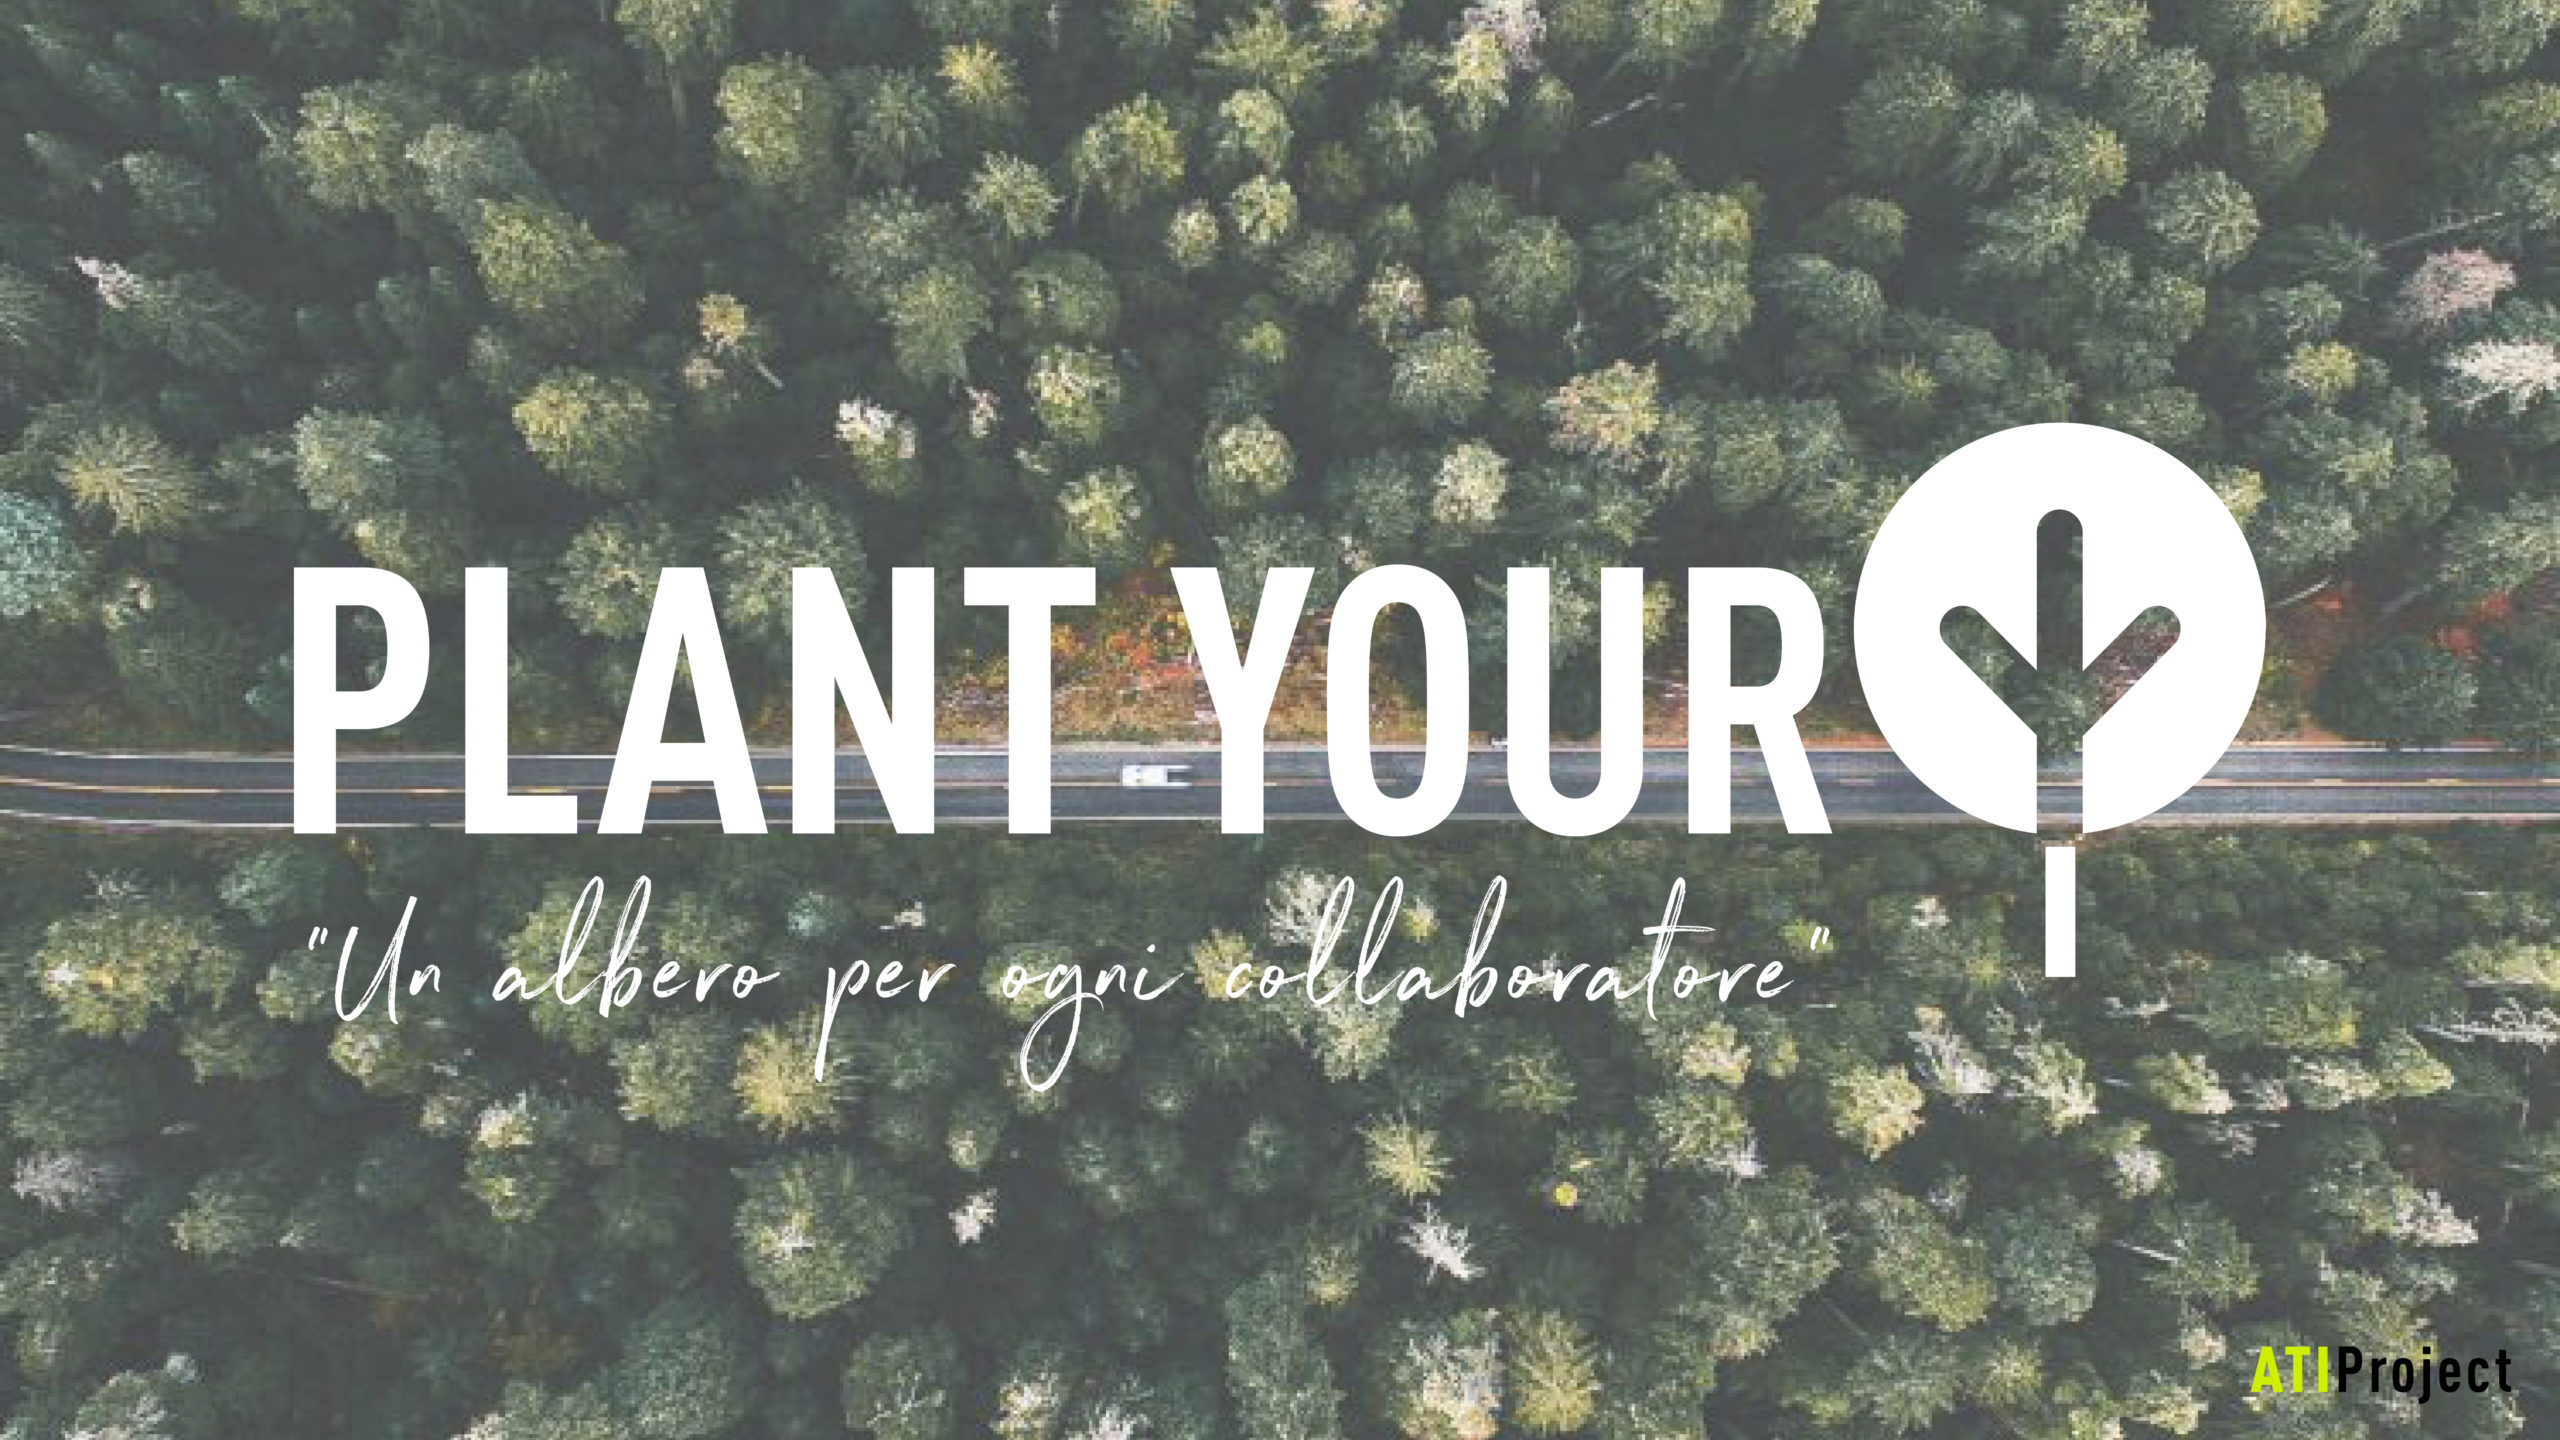 Plan your tree